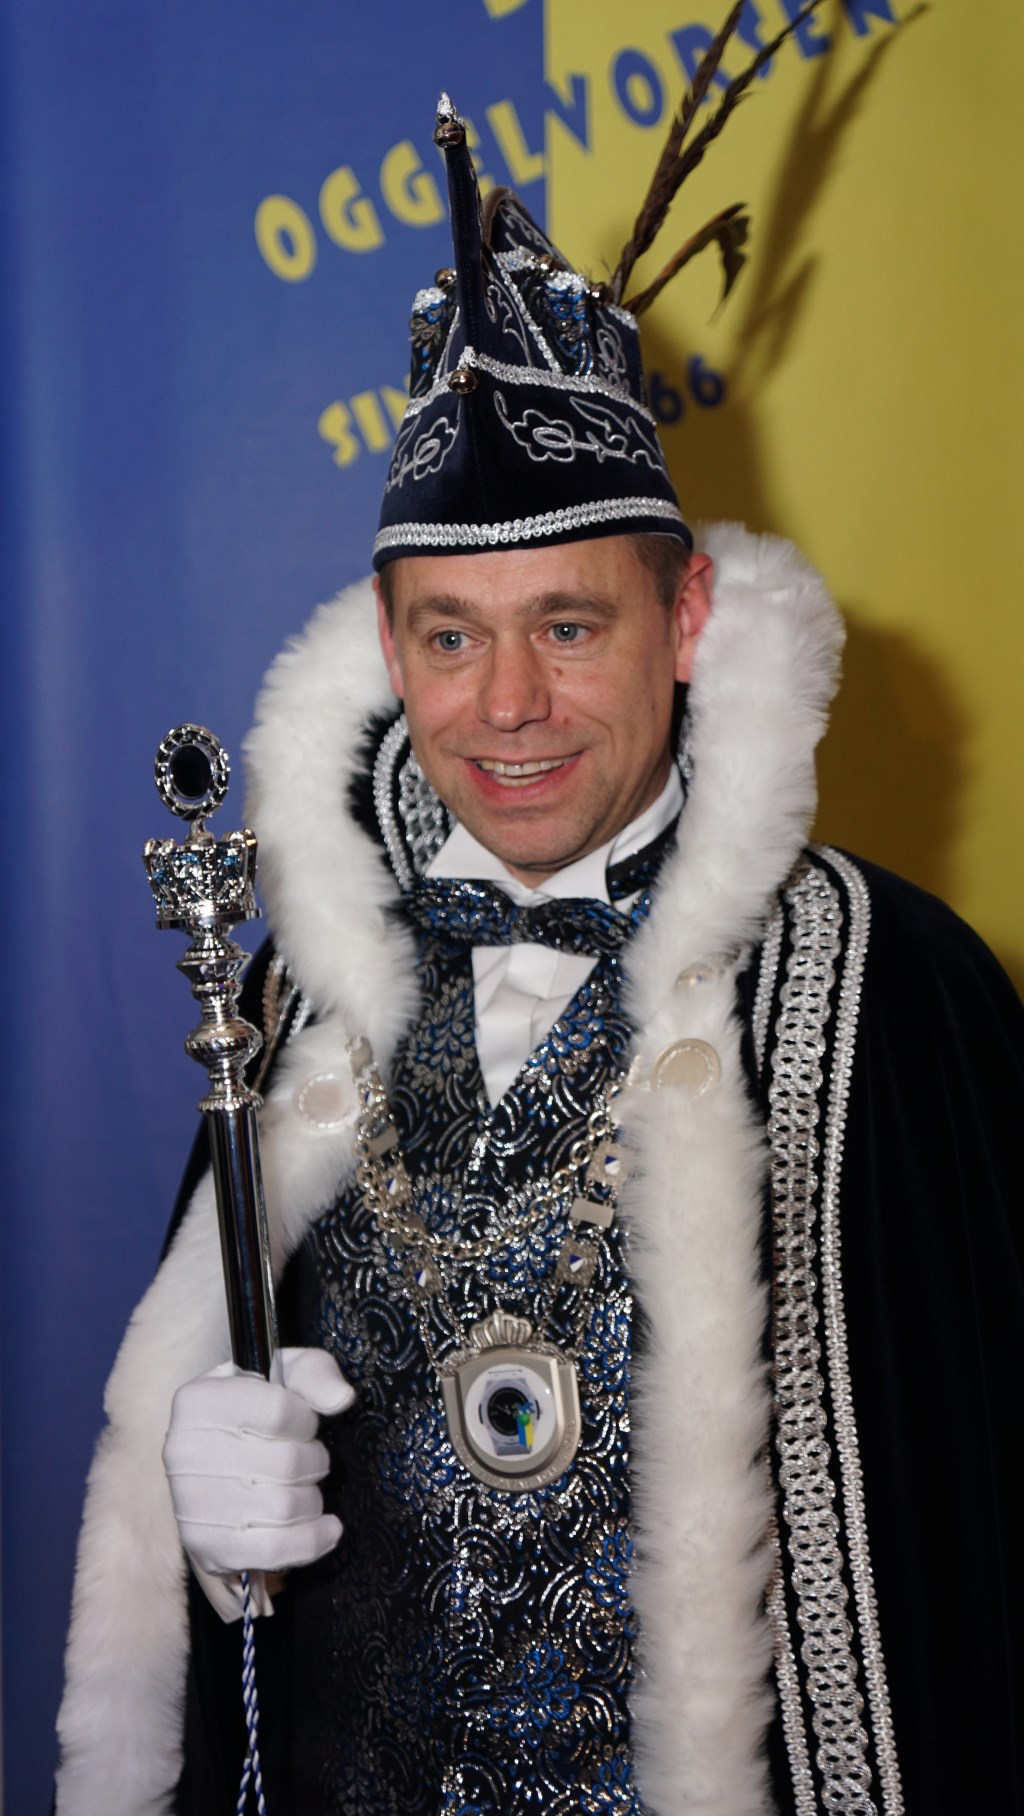 Prins Thomas Den Urste Foto: E.D. Evenementenbegeleiding / Prikbord Esch © MooiBoxtel